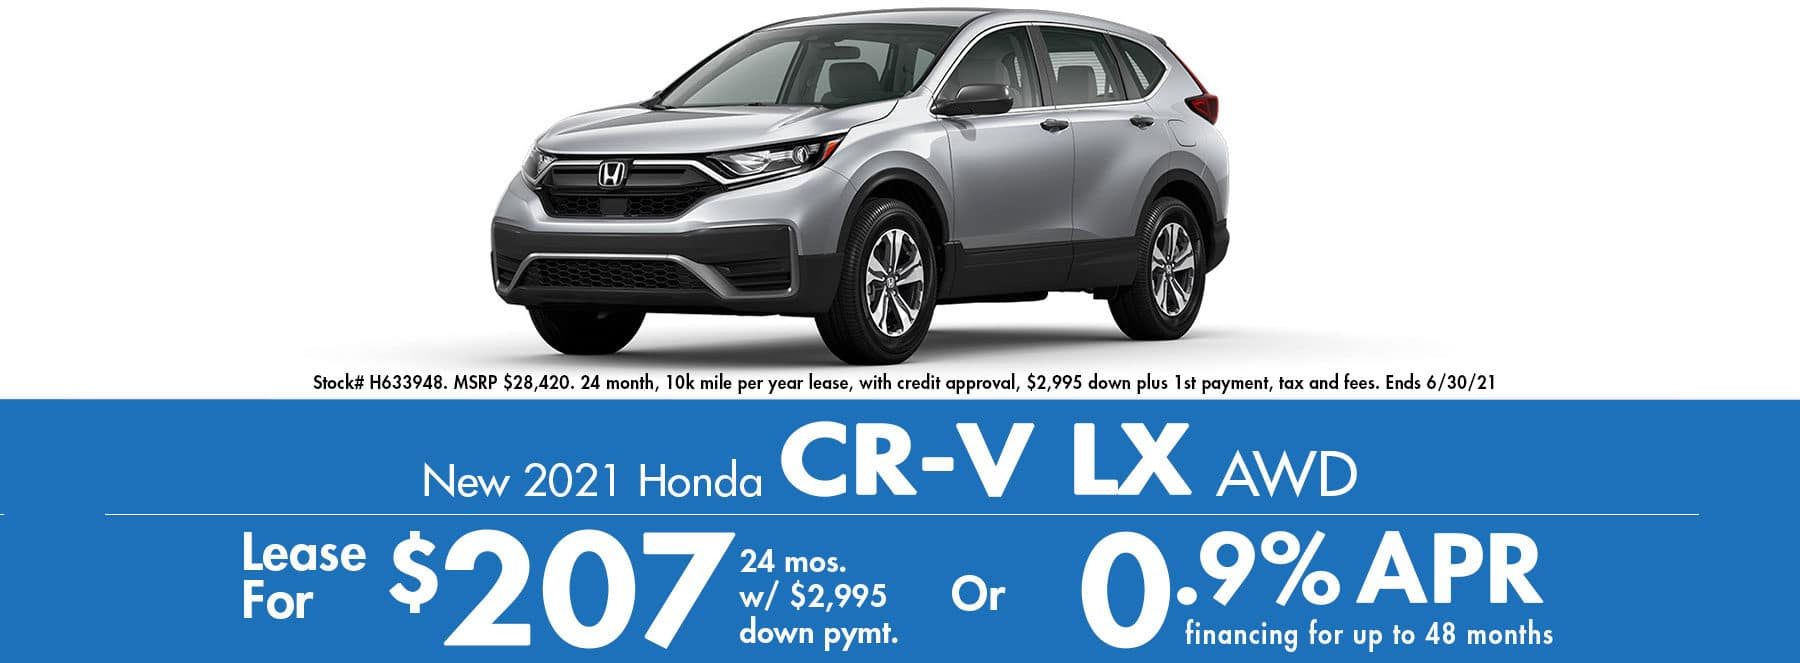 2021 Honda CR-V LX AWD $207 / Month or 0.9% APR!